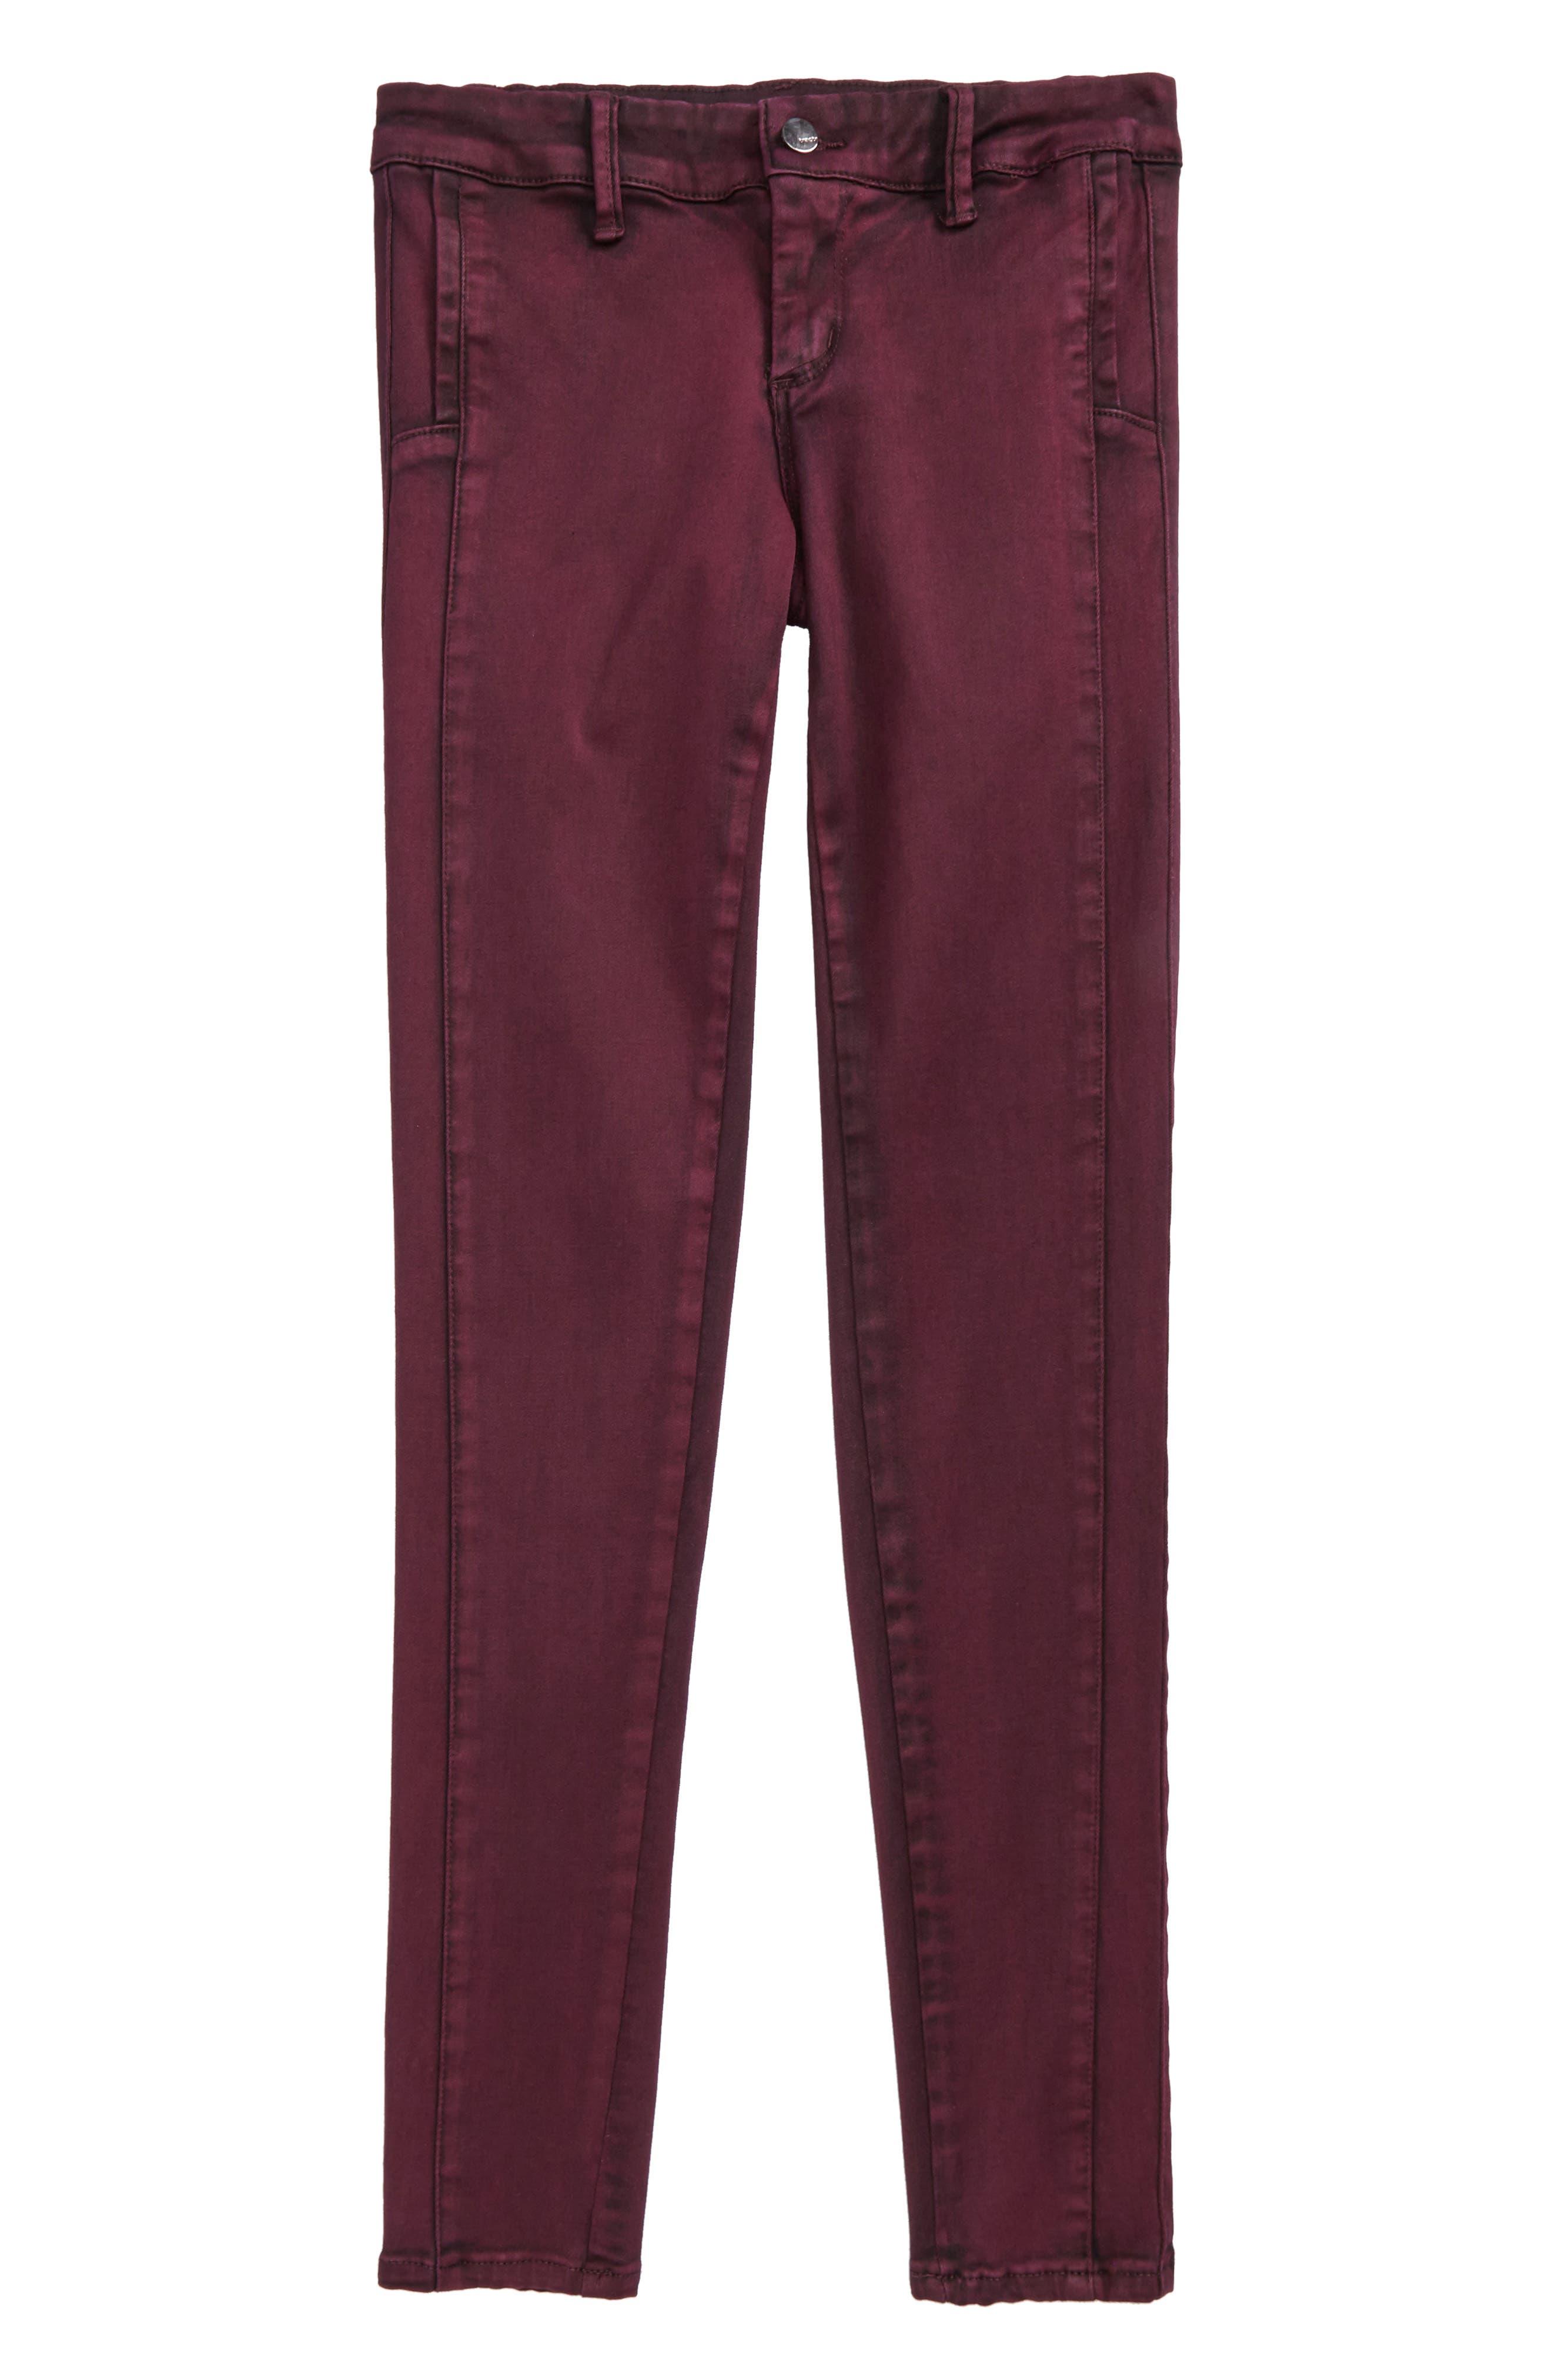 Tractr Overdye Skinny Jeans (Big Girls)